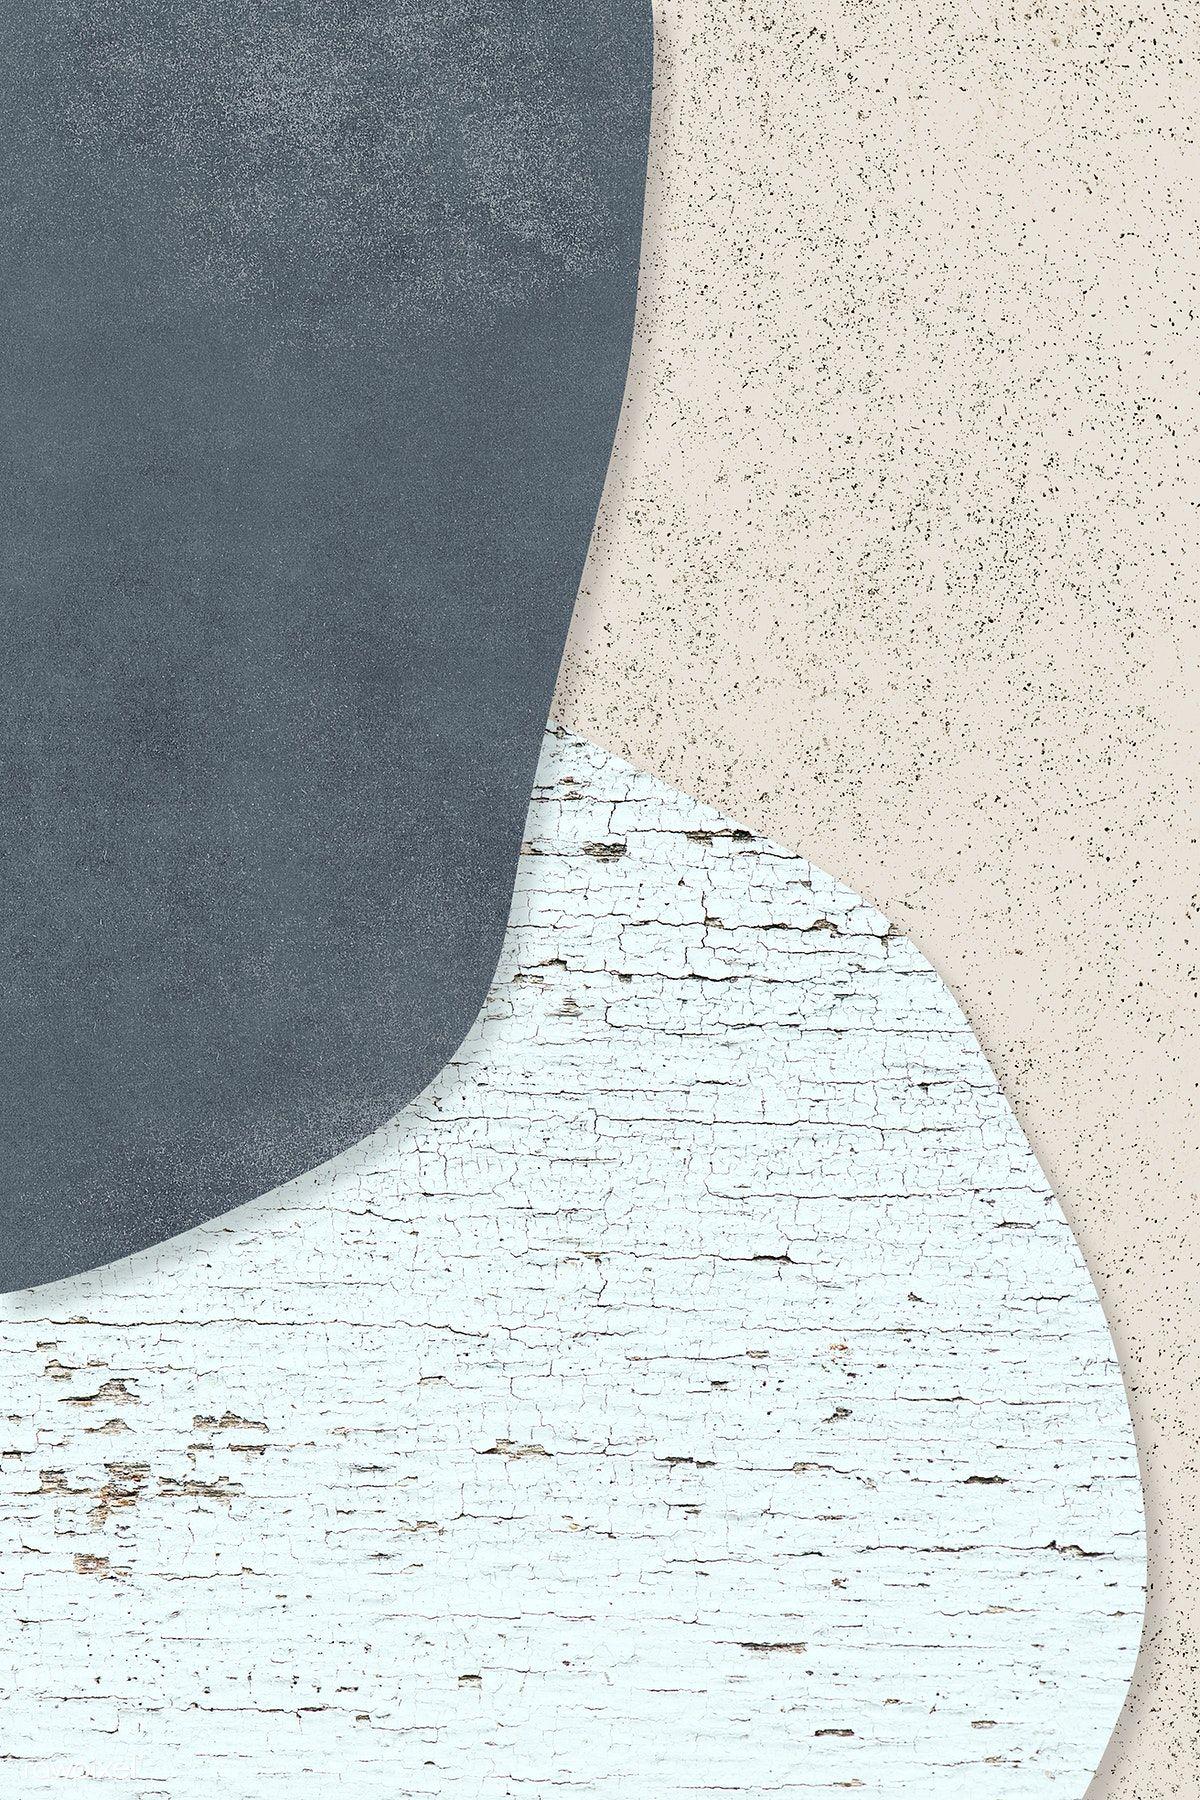 Download premium illustration of Blue pattern on beige